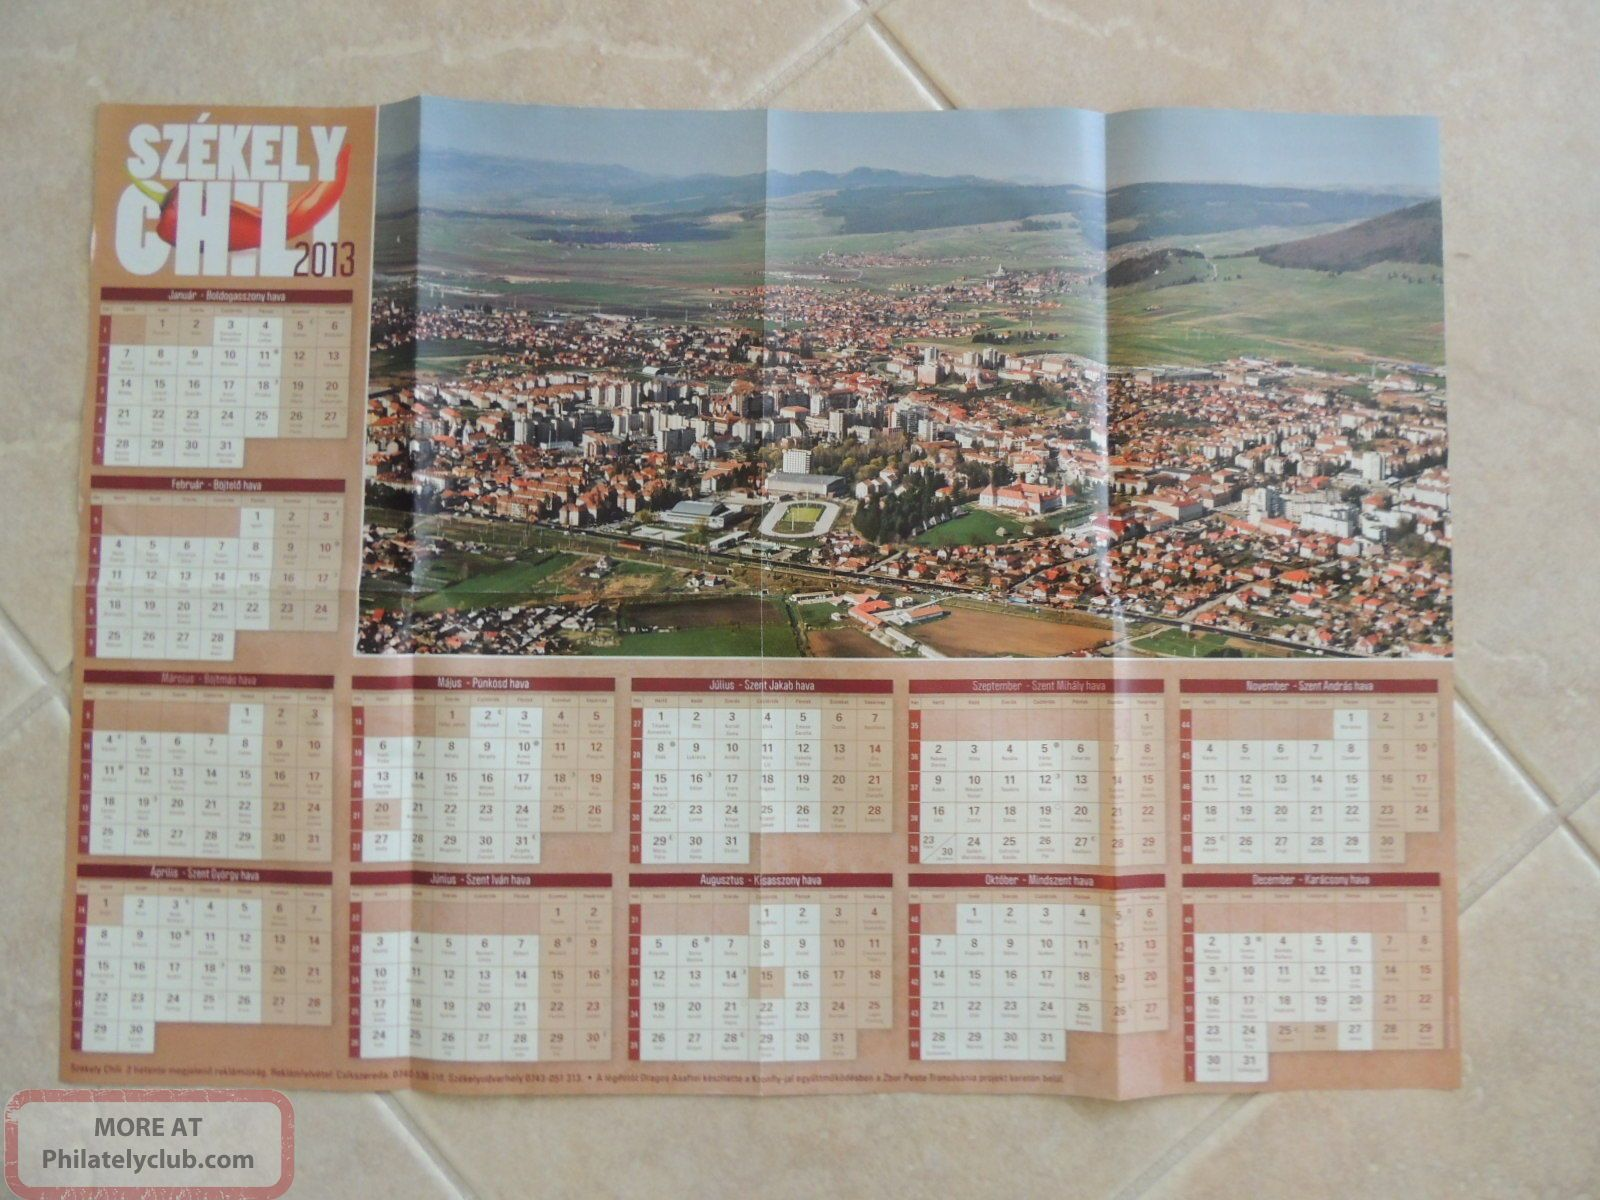 Szekelyudvarhely 2013 Kalendarium City View,  With Name Days, Worldwide photo